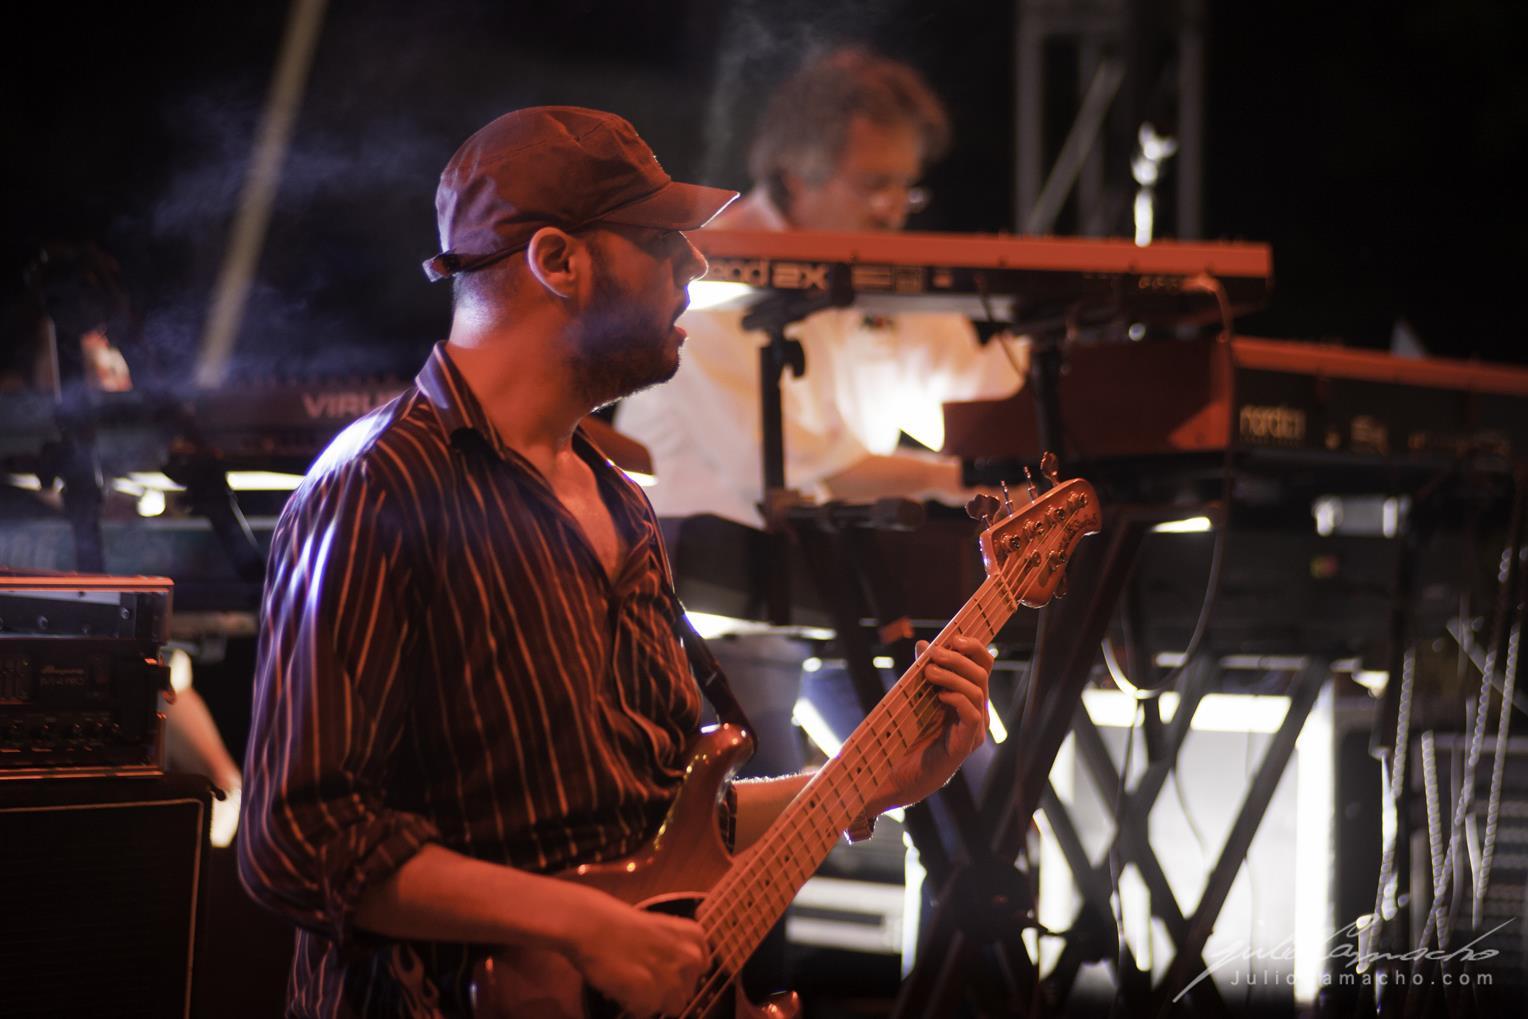 2014-10-30 31 CAST TOUR Ensenada y Tijuana - 1615 - www.Juli (Copy).jpg